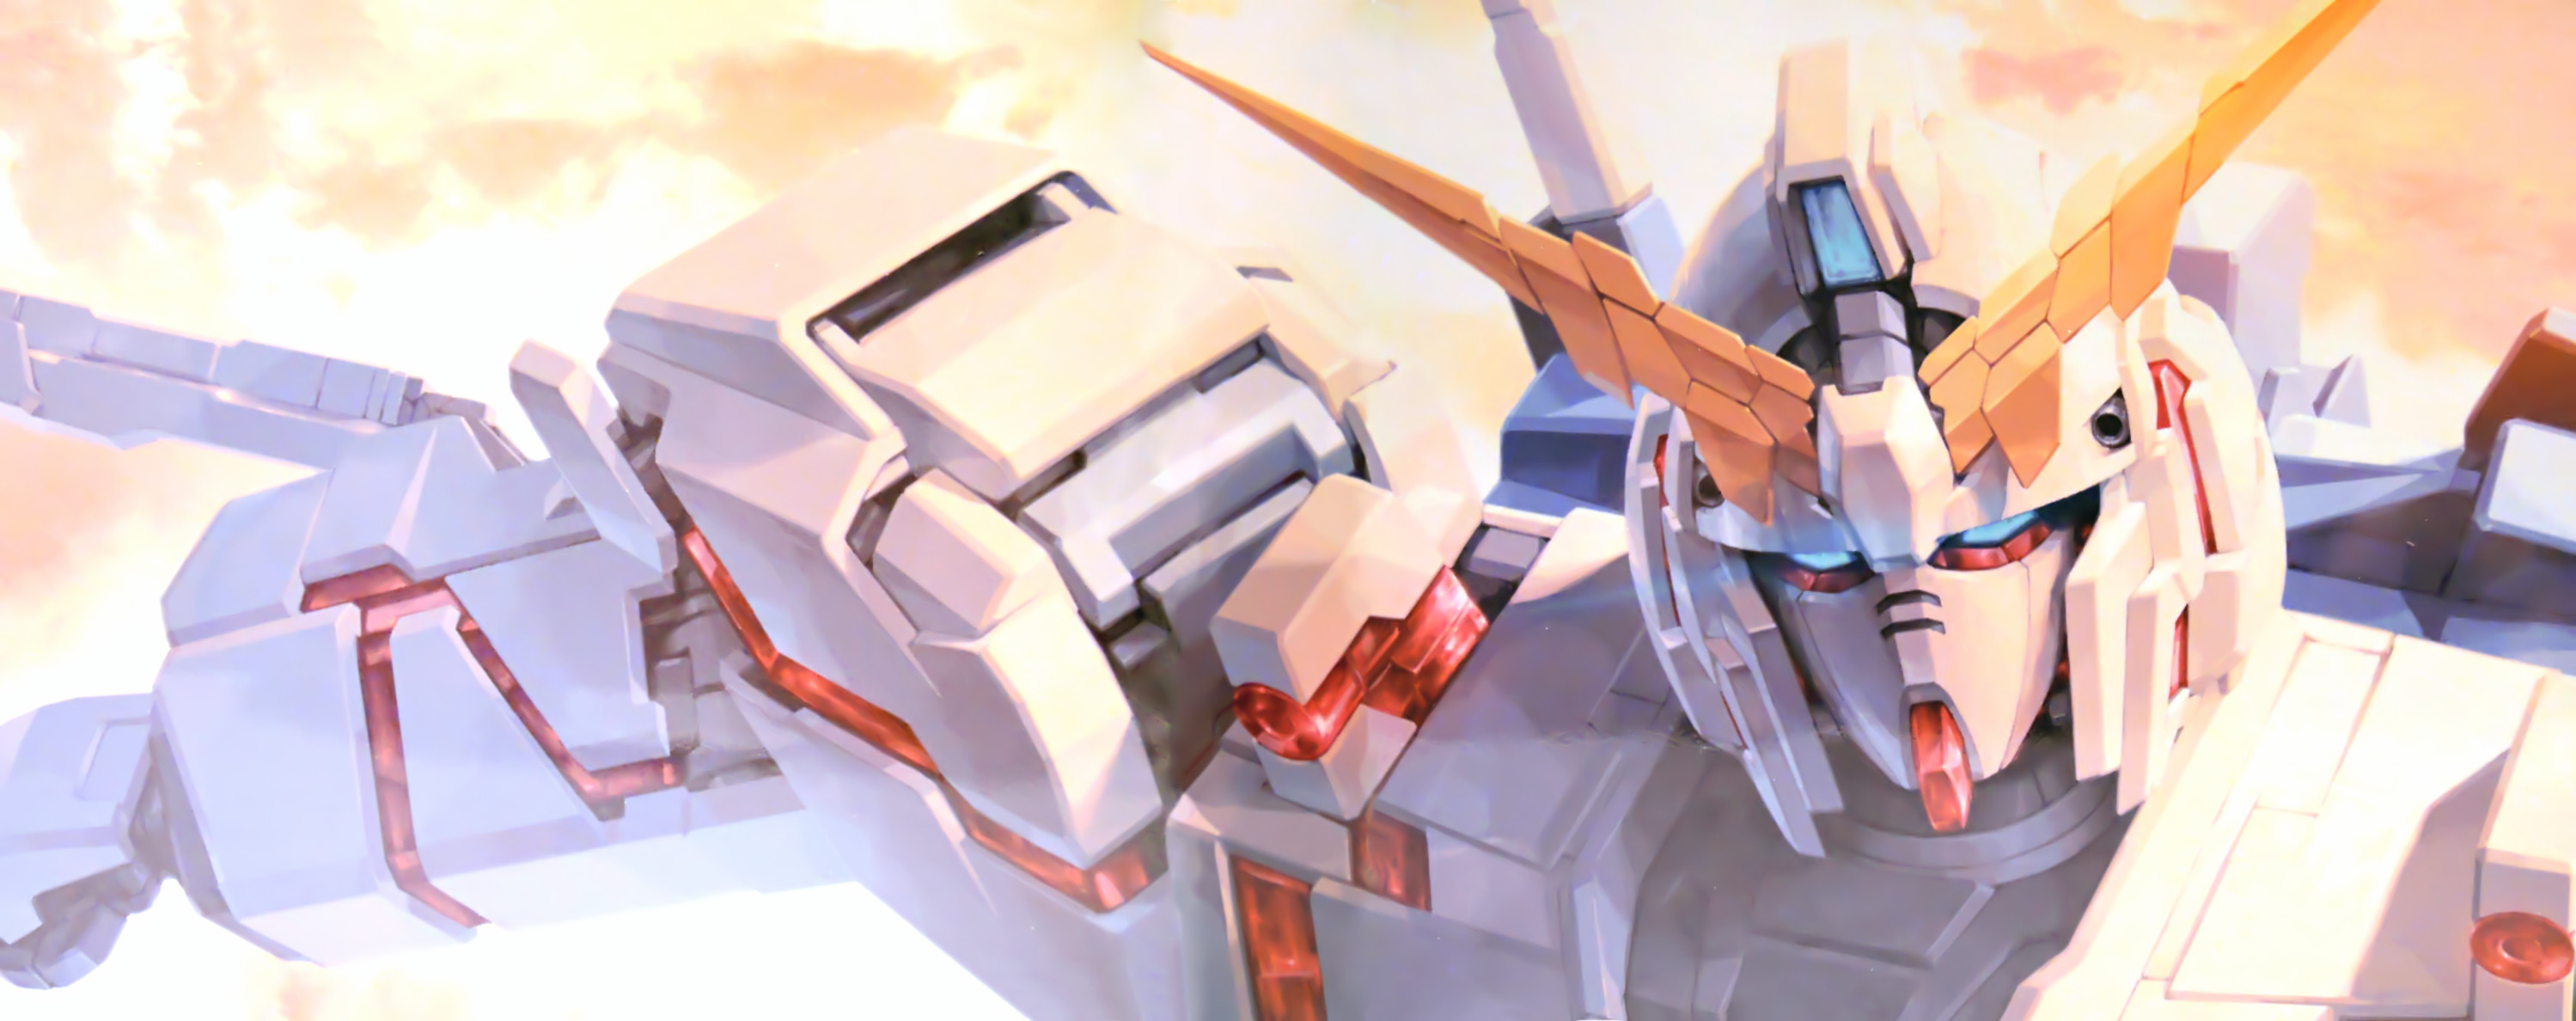 Gundam Unicorn Wallpapers Hd Resolution